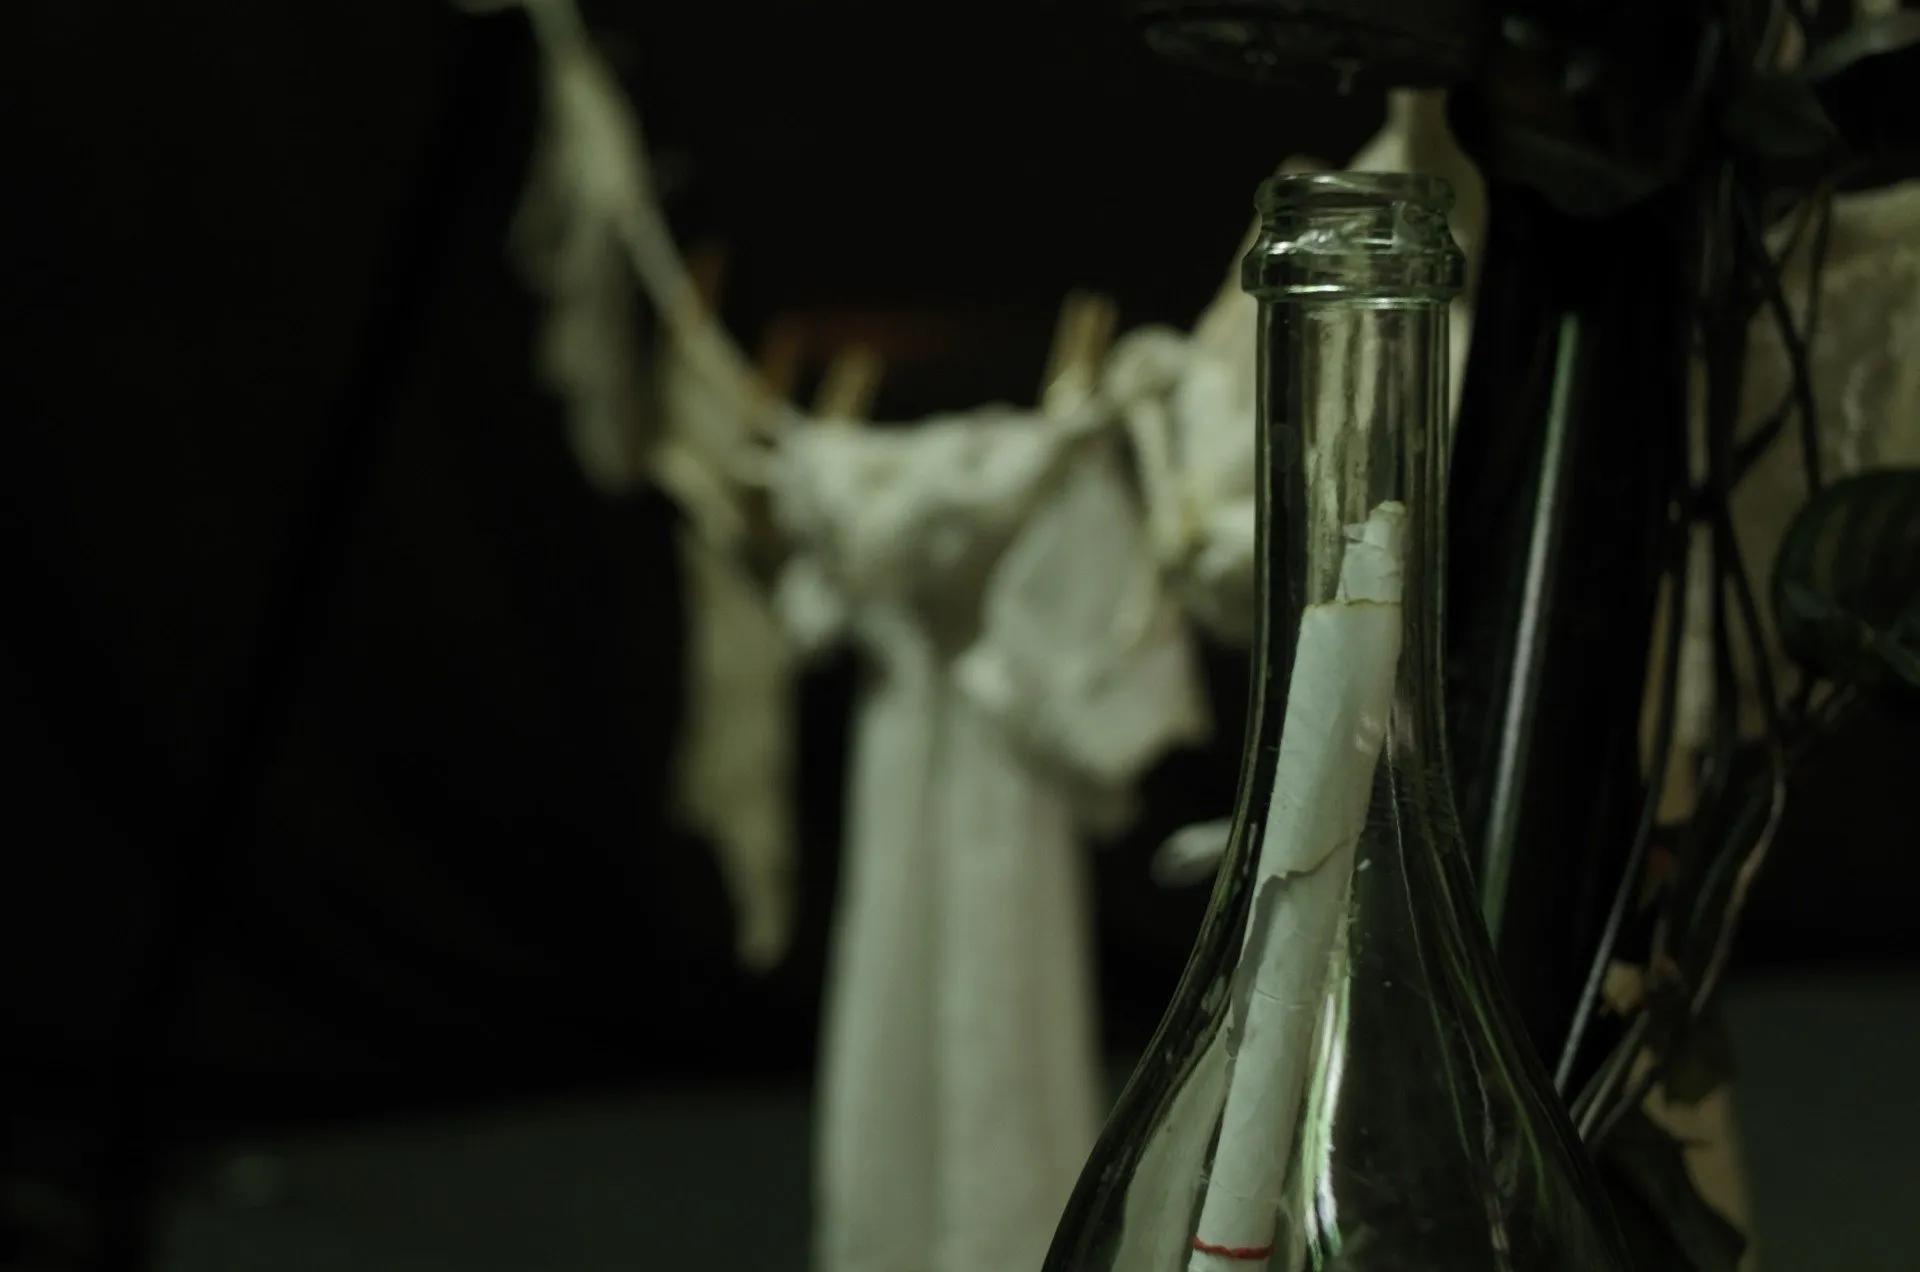 botellaprimerplano-1920